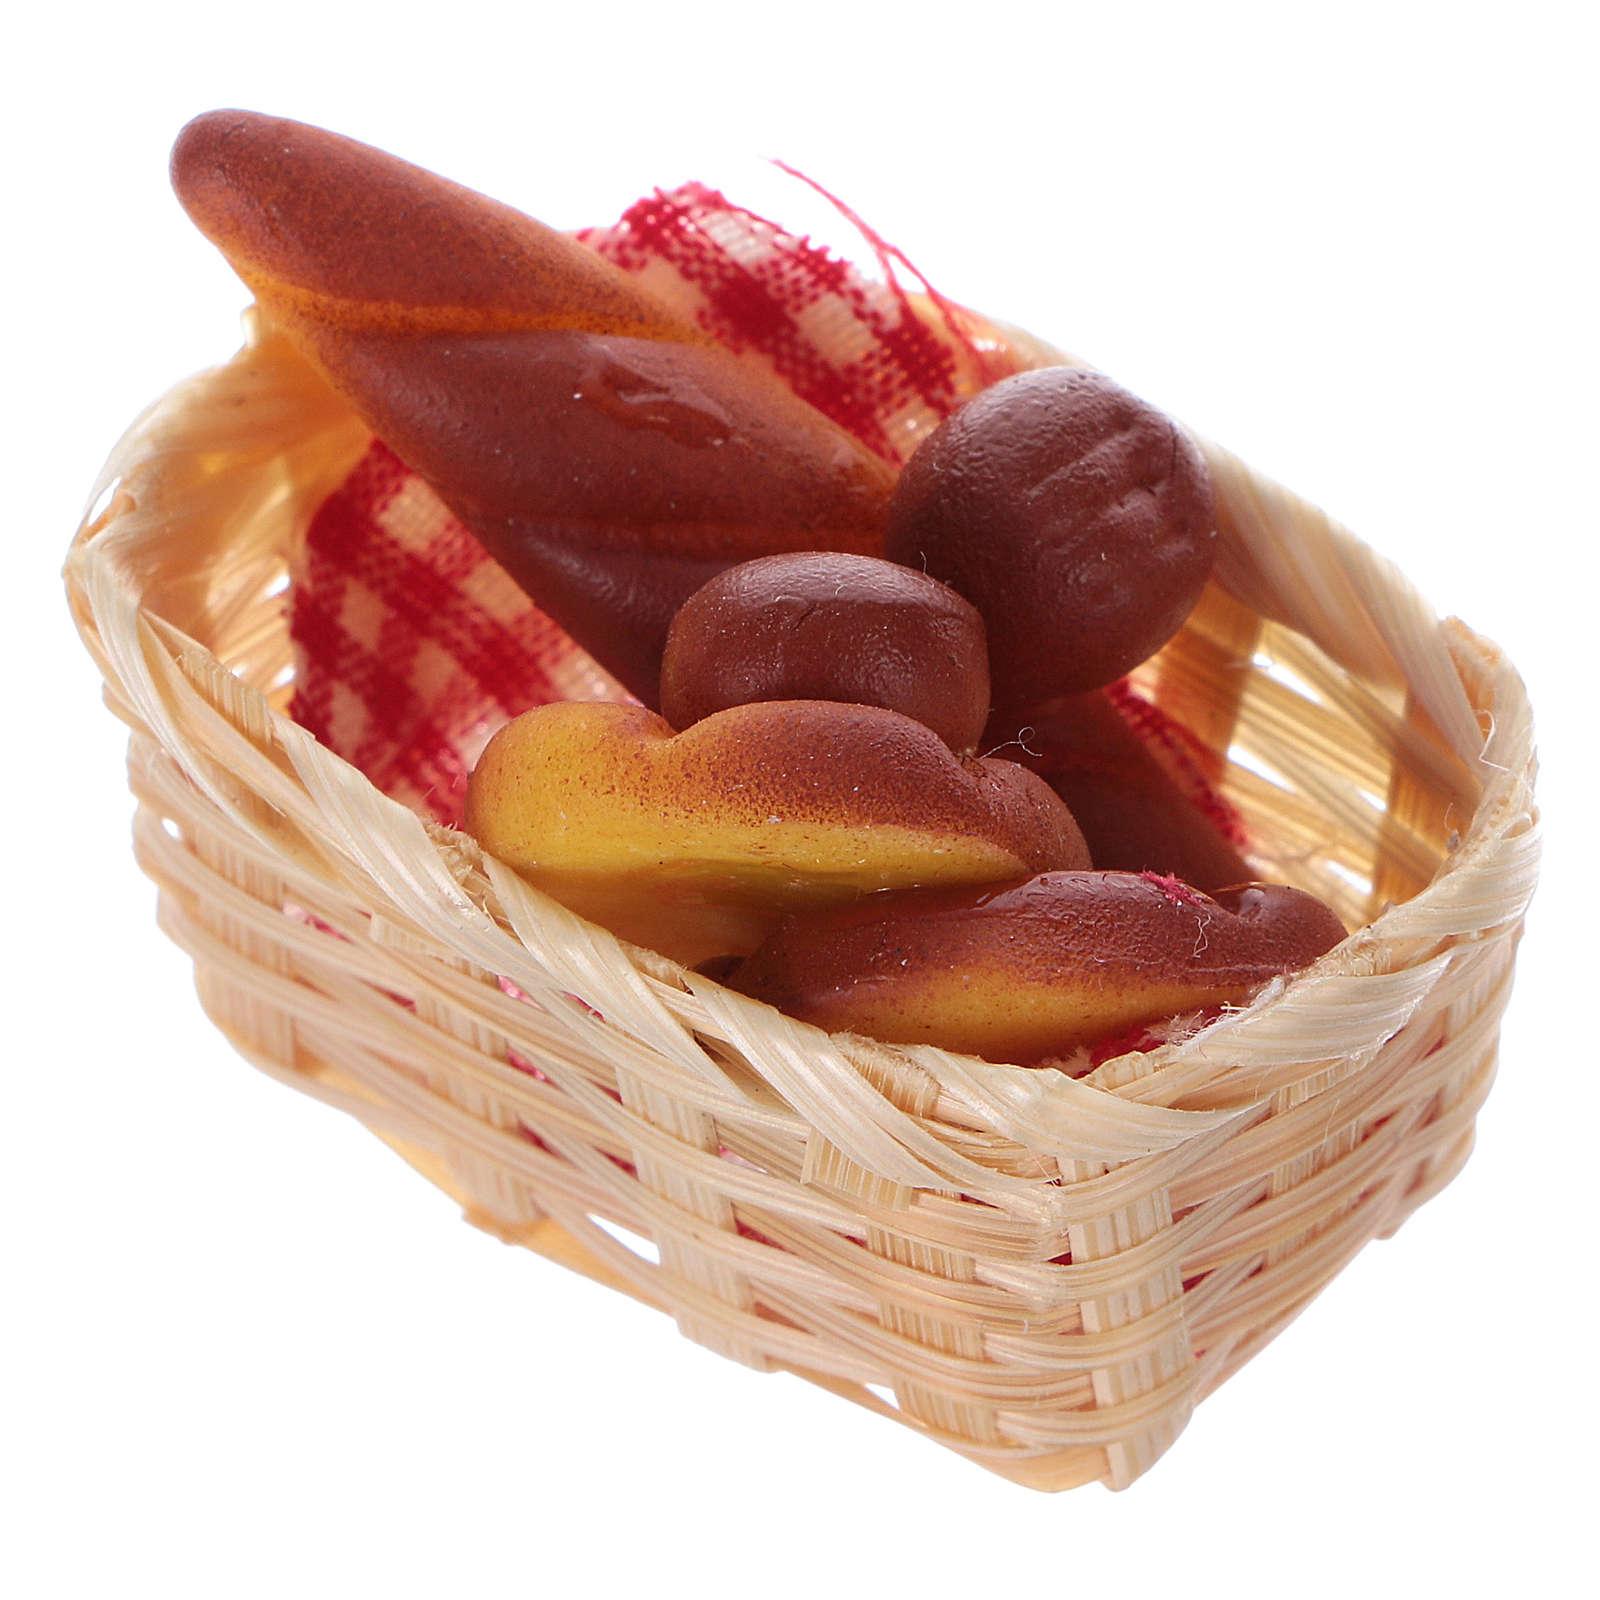 Kork aus Korb mit Brot Krippe 4